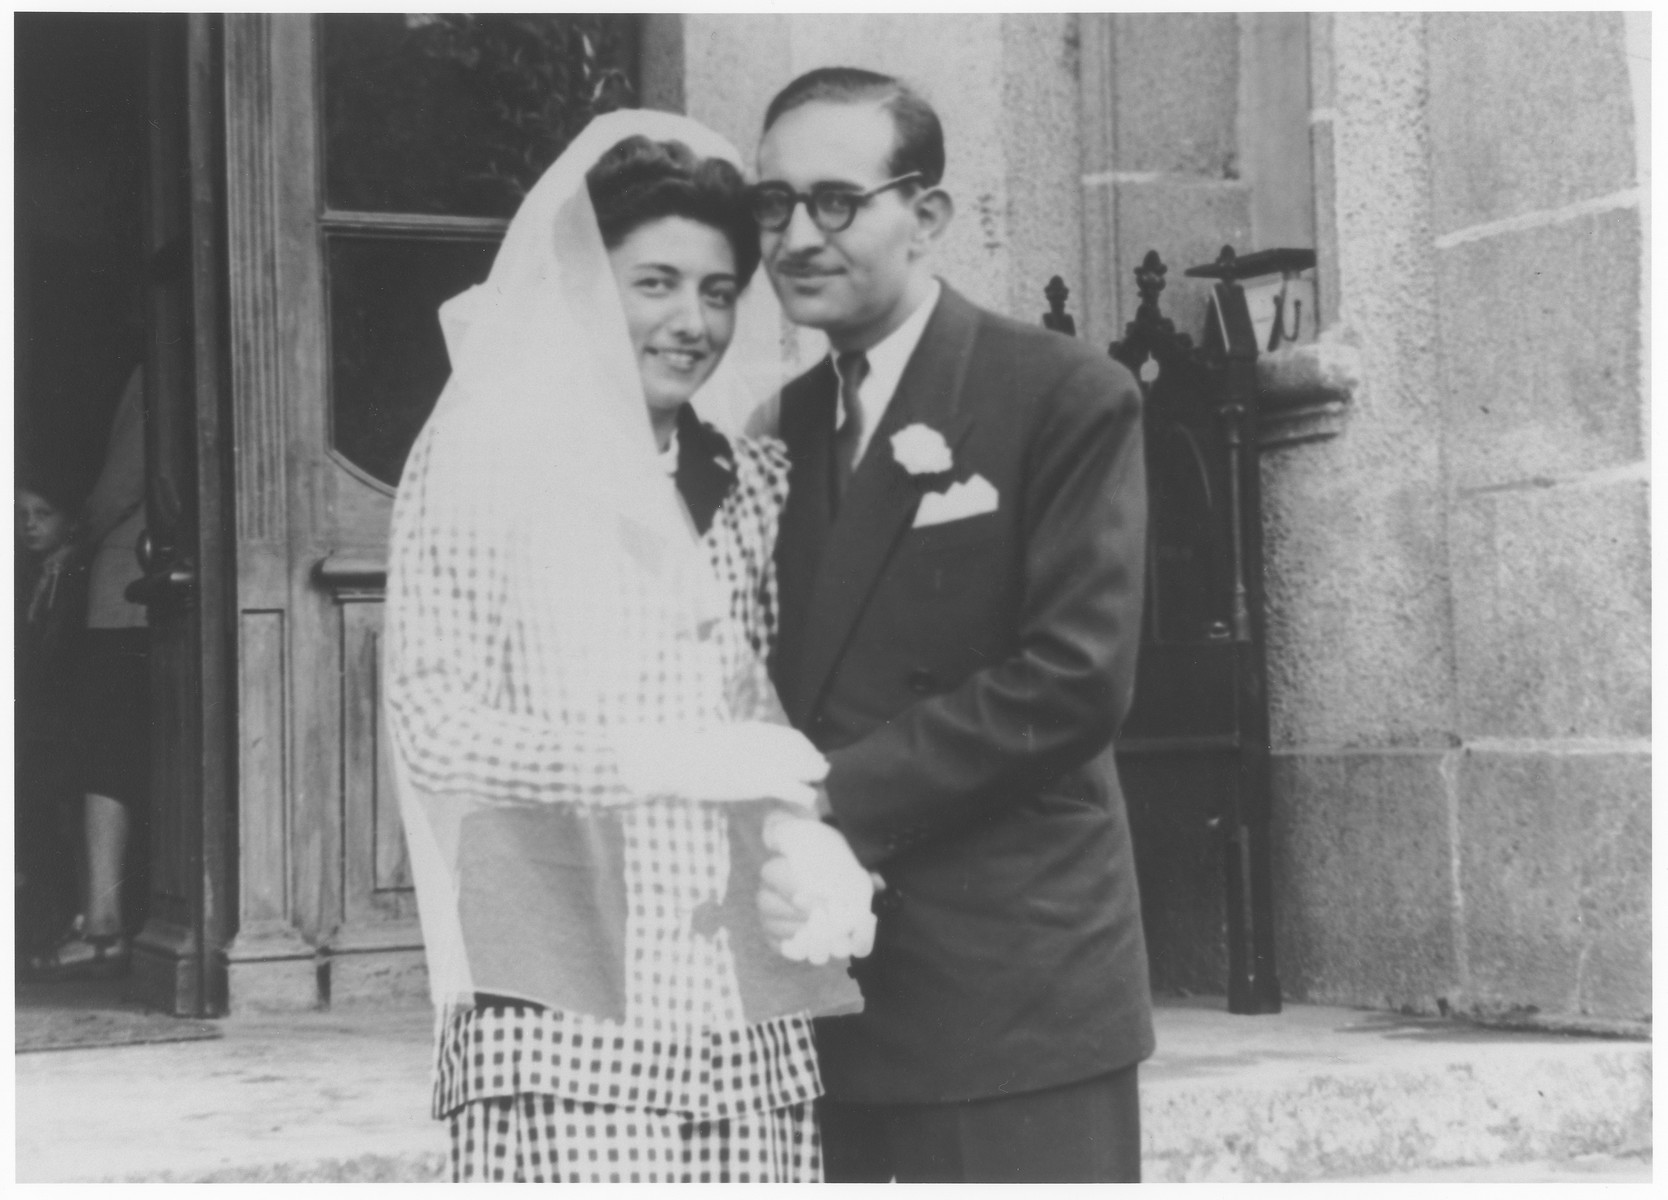 Wedding portrait of OSE administrators Julien Samuel and Vivette Hermann at the Le Couret children's home.